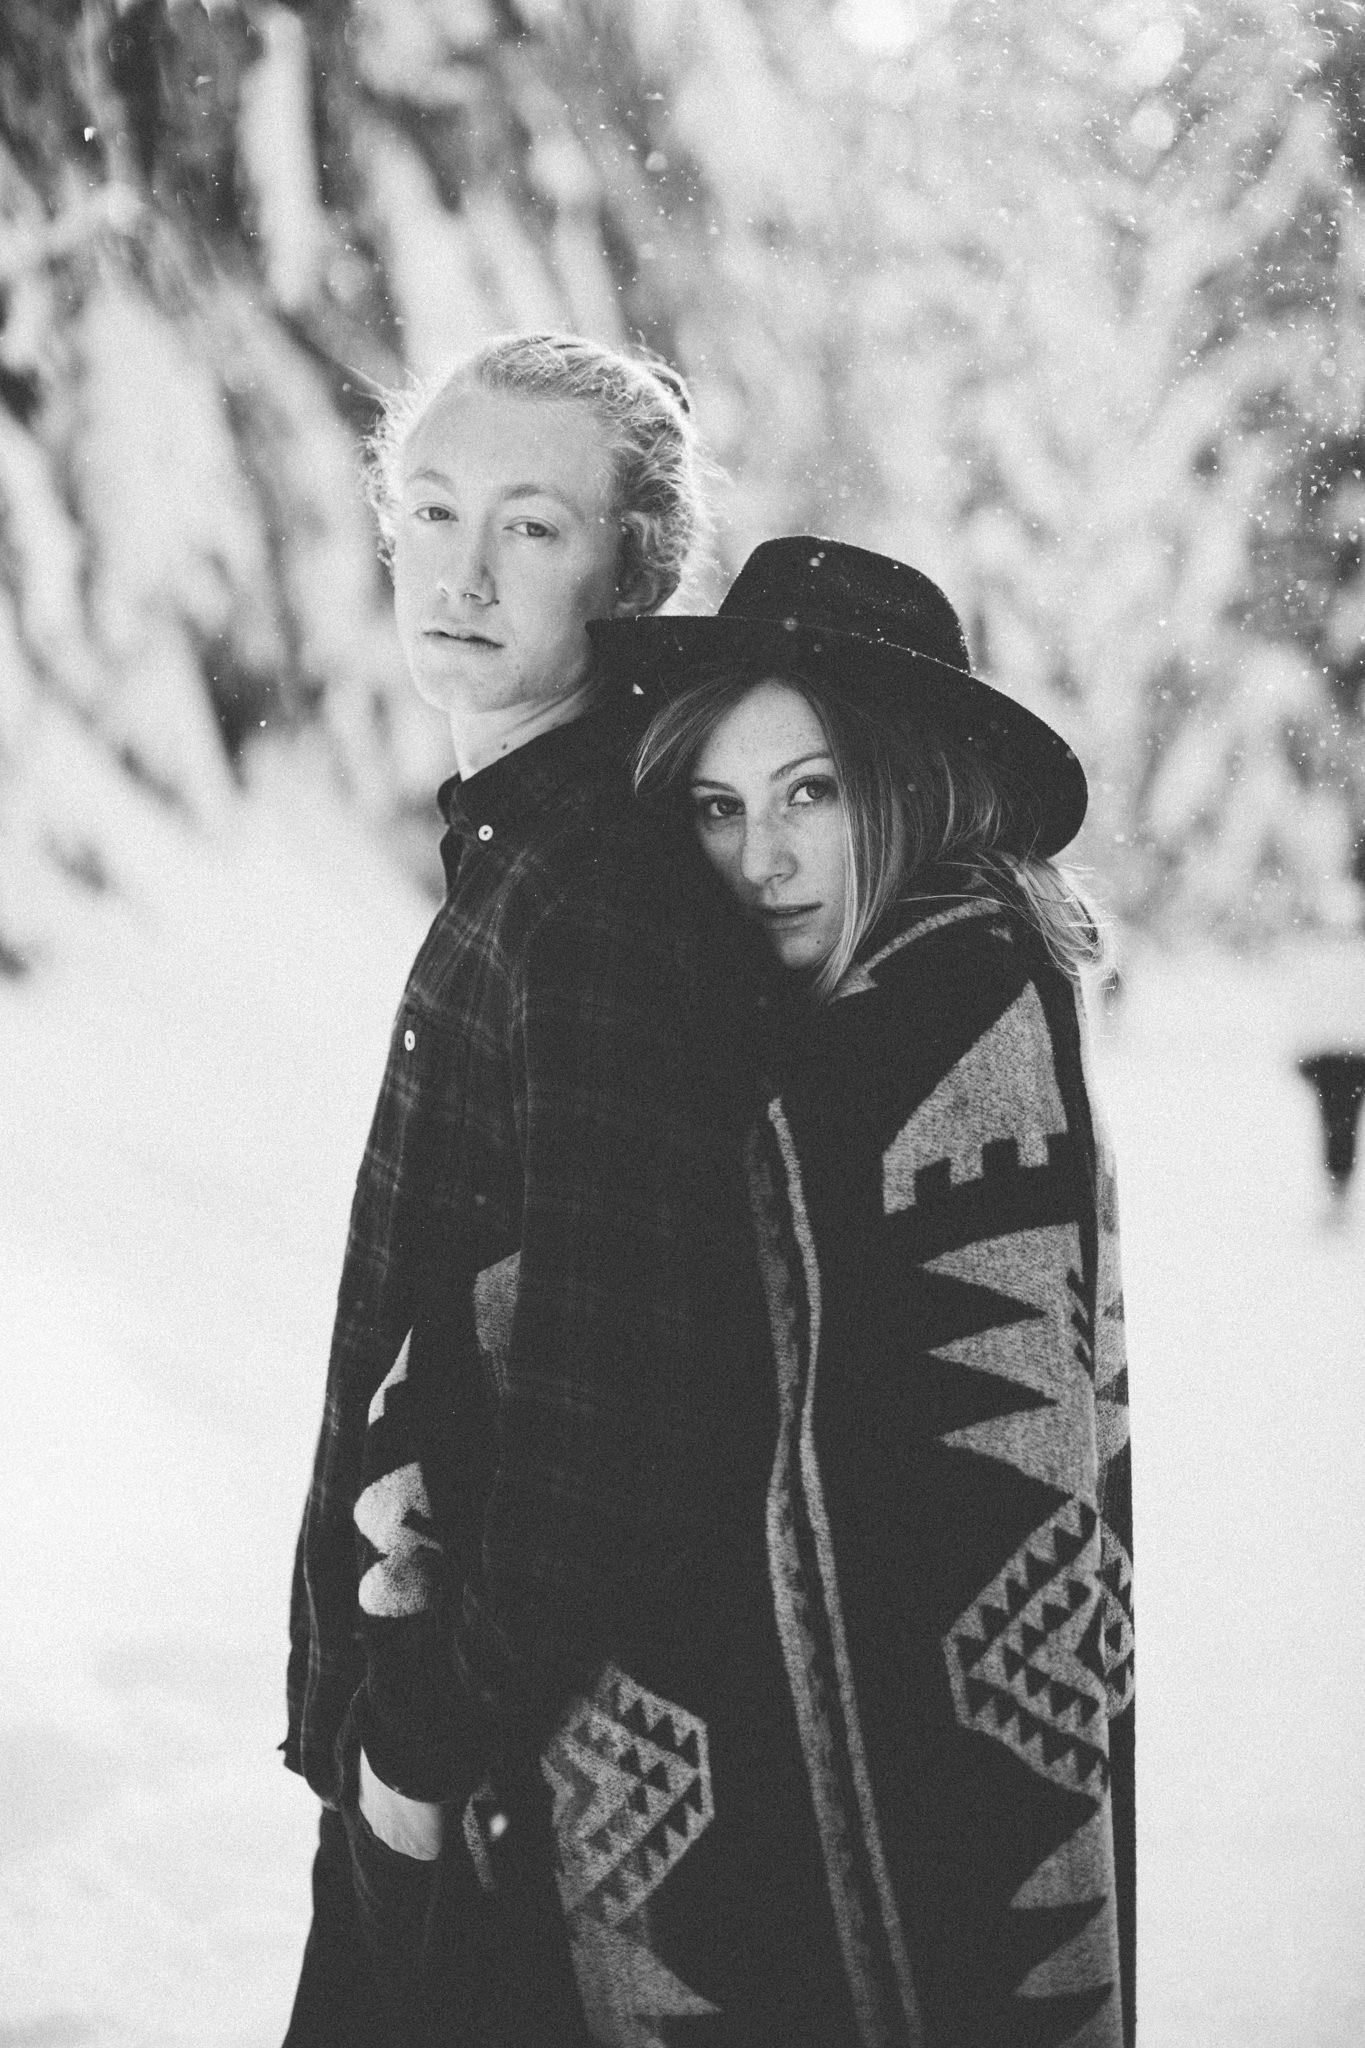 Winter portraits: Snowy Couples Engagement Session Seattle Washington